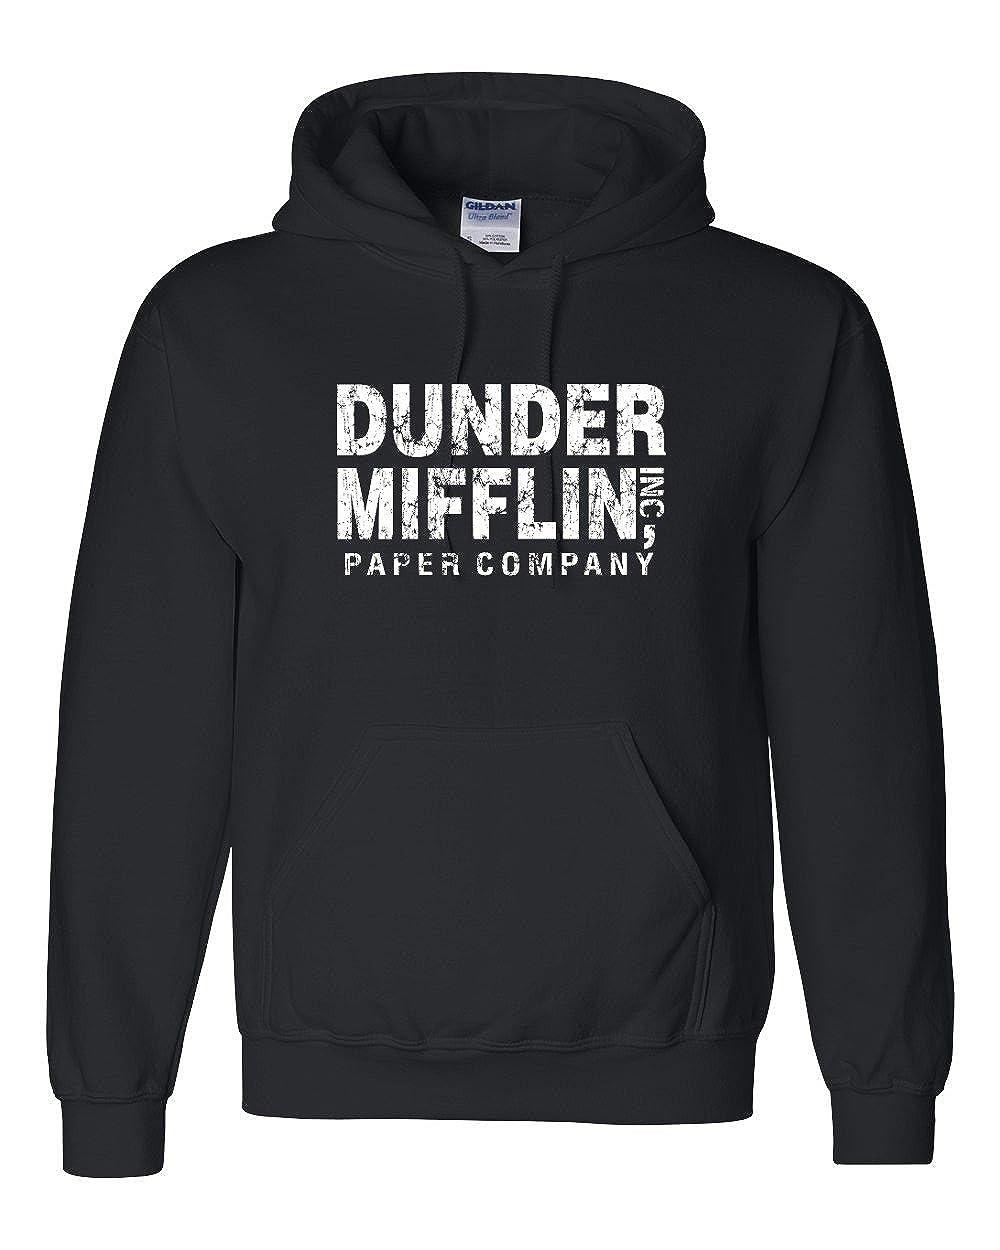 The Creating Studio Adult Dunder Mifflin Hooded Sweatshirt Distressed Design